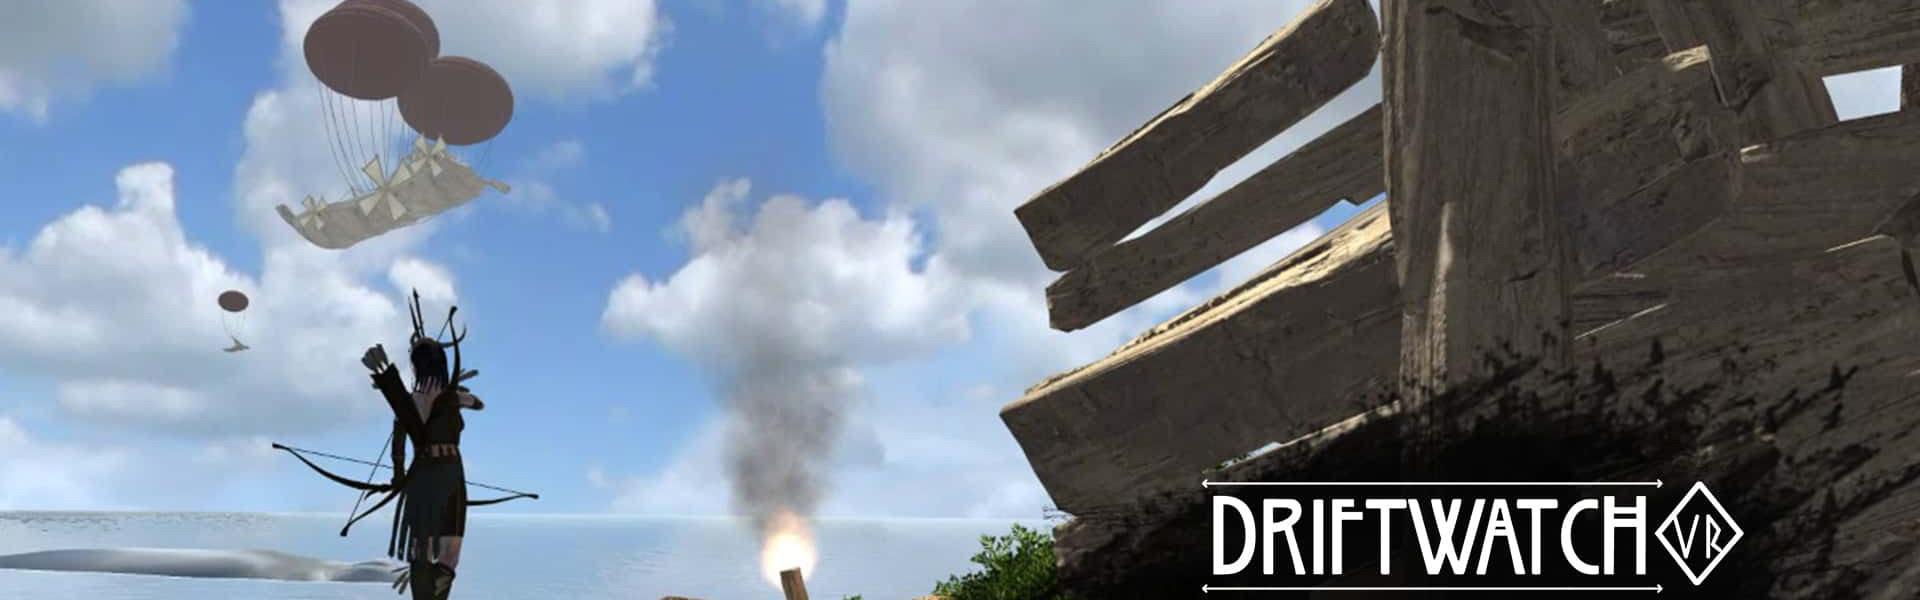 Driftwatch [VR] Steam Key GLOBAL